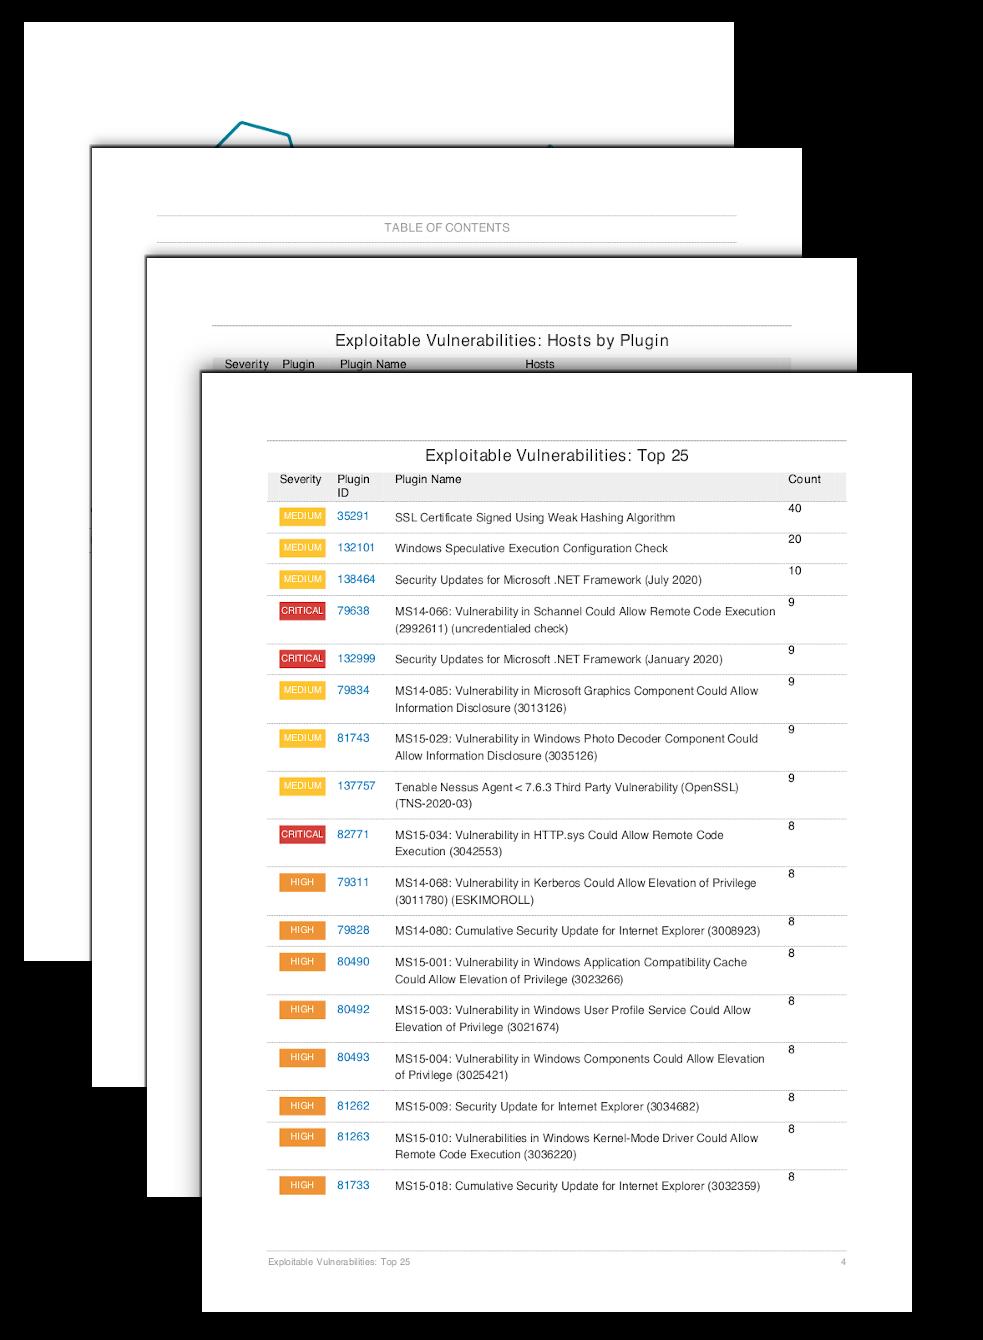 Exploitable Vulnerabilities Report